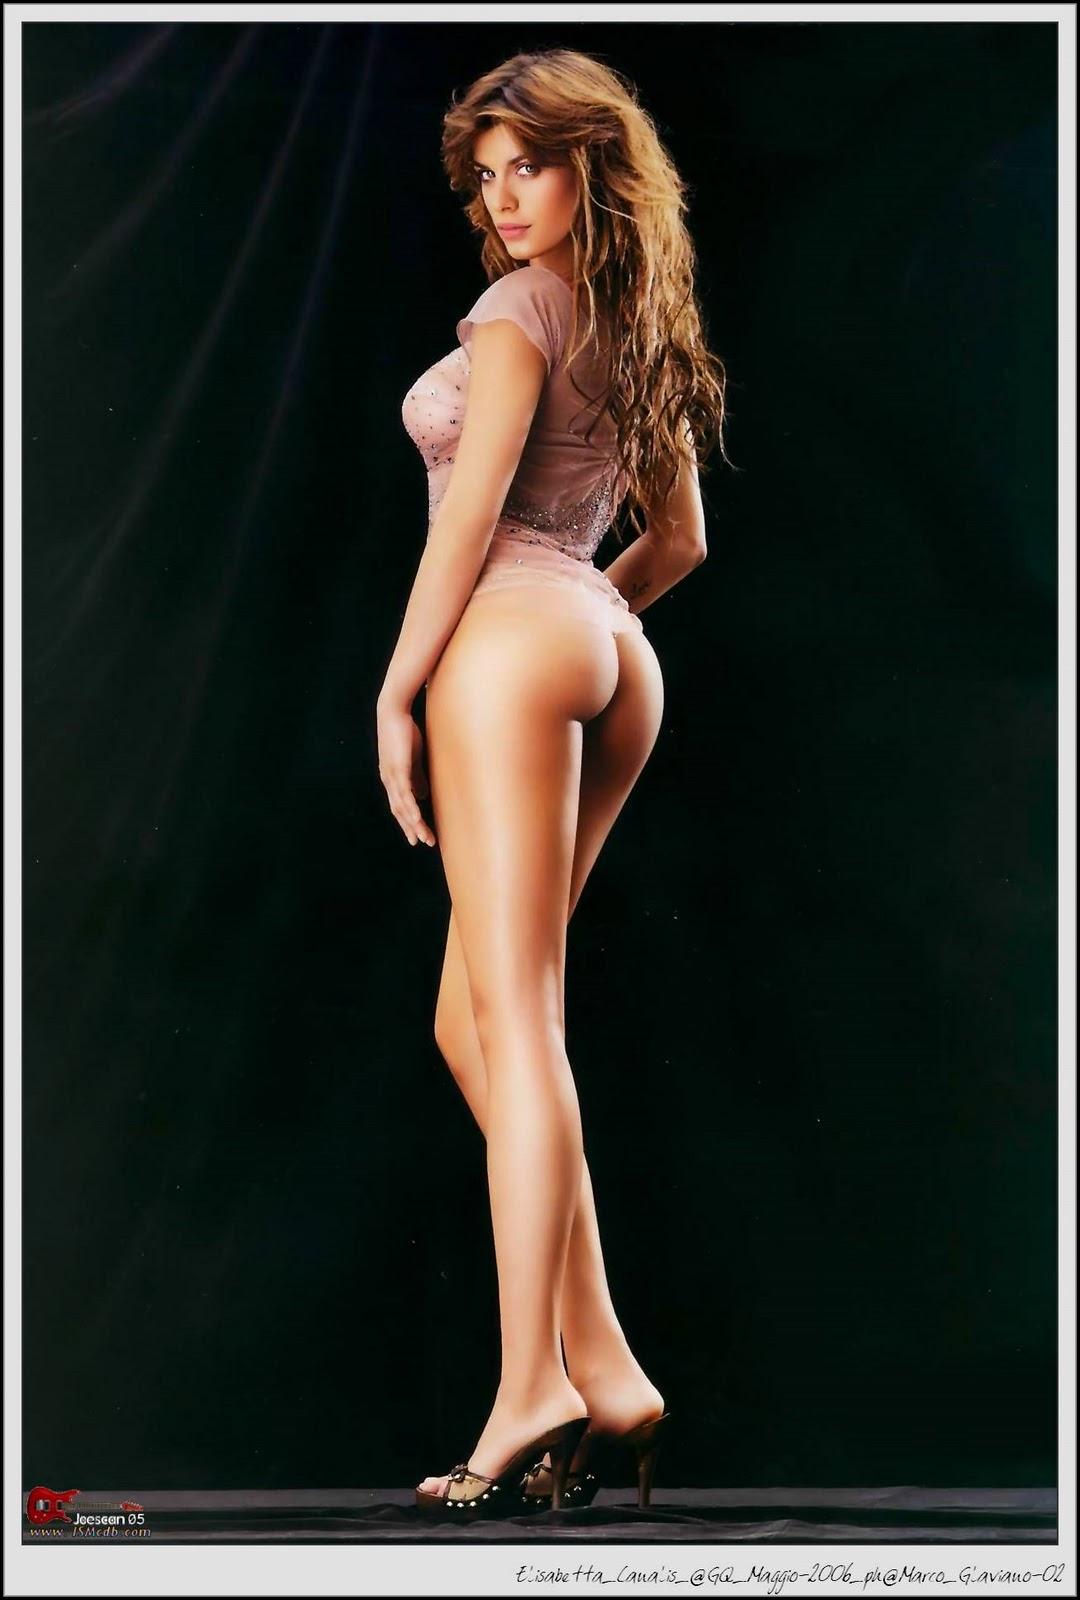 http://4.bp.blogspot.com/_Pynesjr0zZ4/S86gIAtx2GI/AAAAAAAAAoQ/Wi9HK3TfJQE/s1600/Elisabetta_Canalis_@GQ_Maggio-2006_ph@Marco_Glaviano-02.jpg